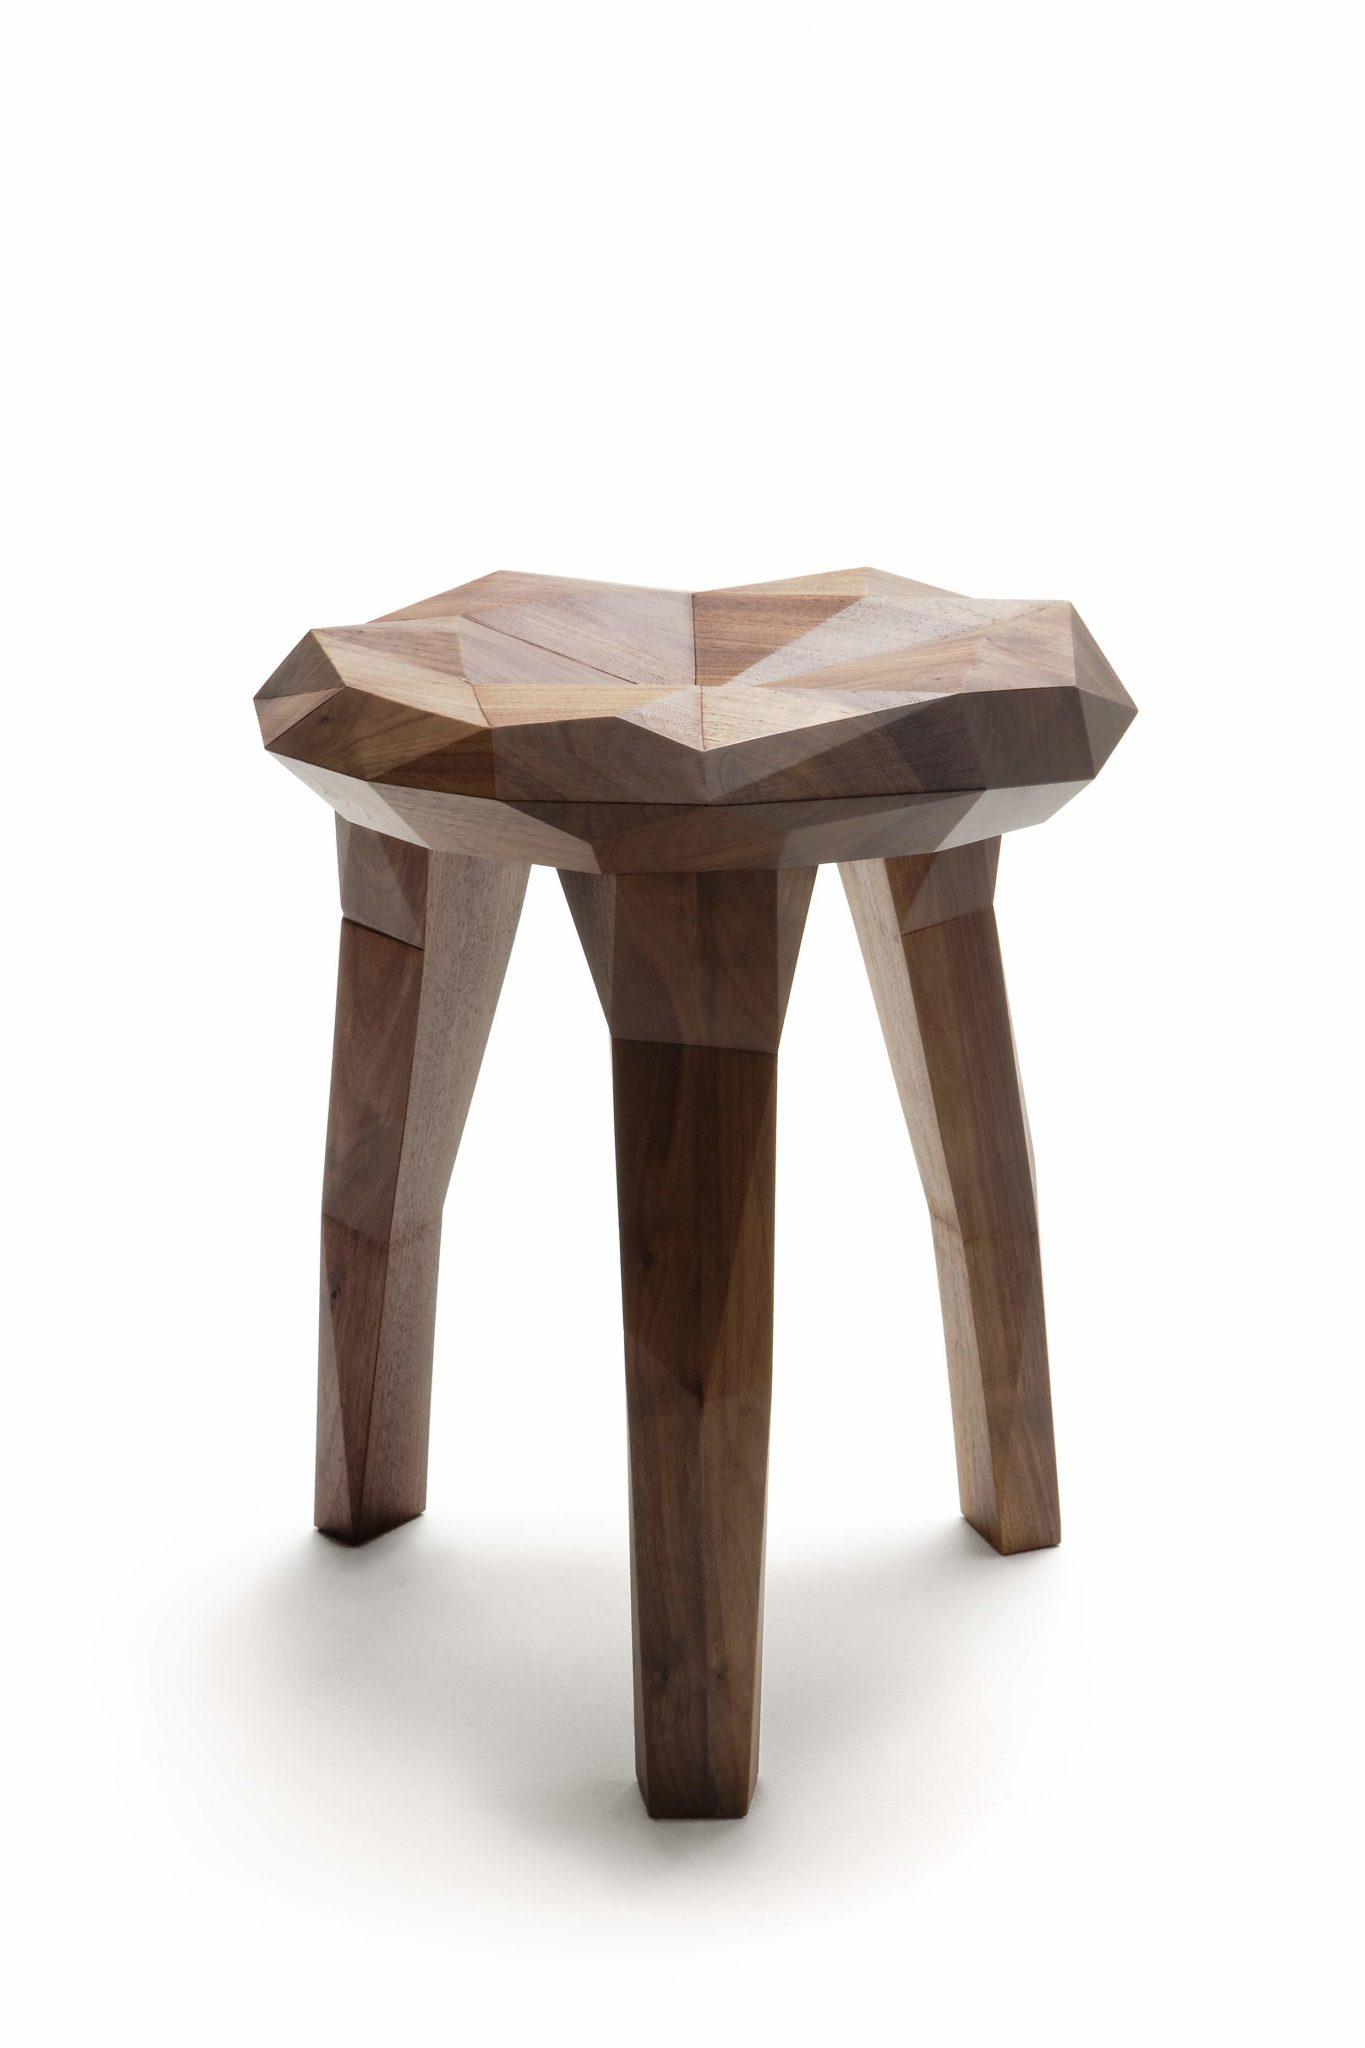 Tabouret bois design STOCKHOLM study par NIKARI